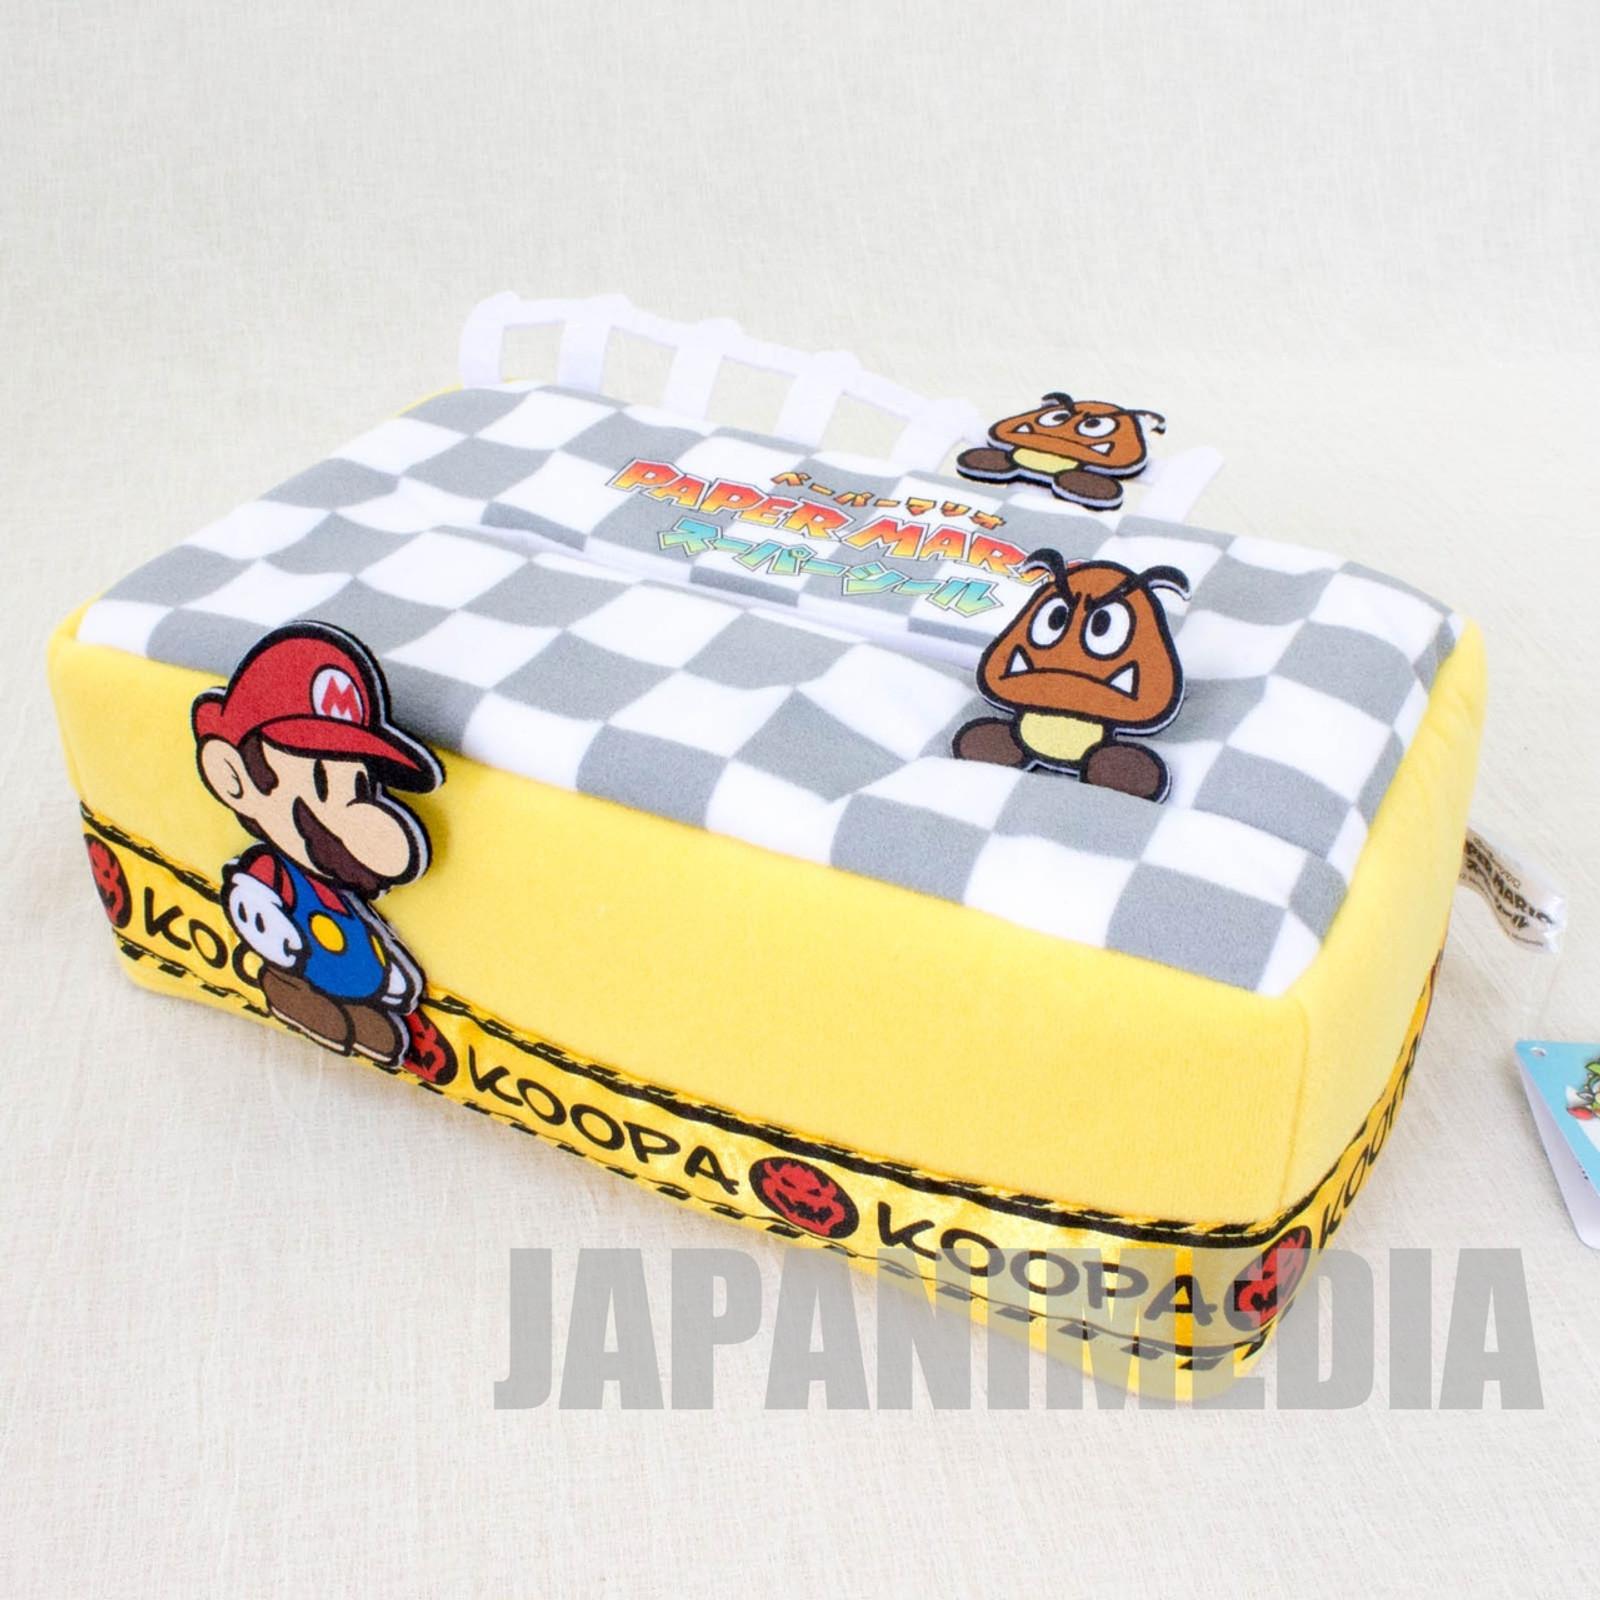 PAPER MARIO Diorama Tissue Case Cover NINTEND 3DS Sticker Star JAPAN GAME